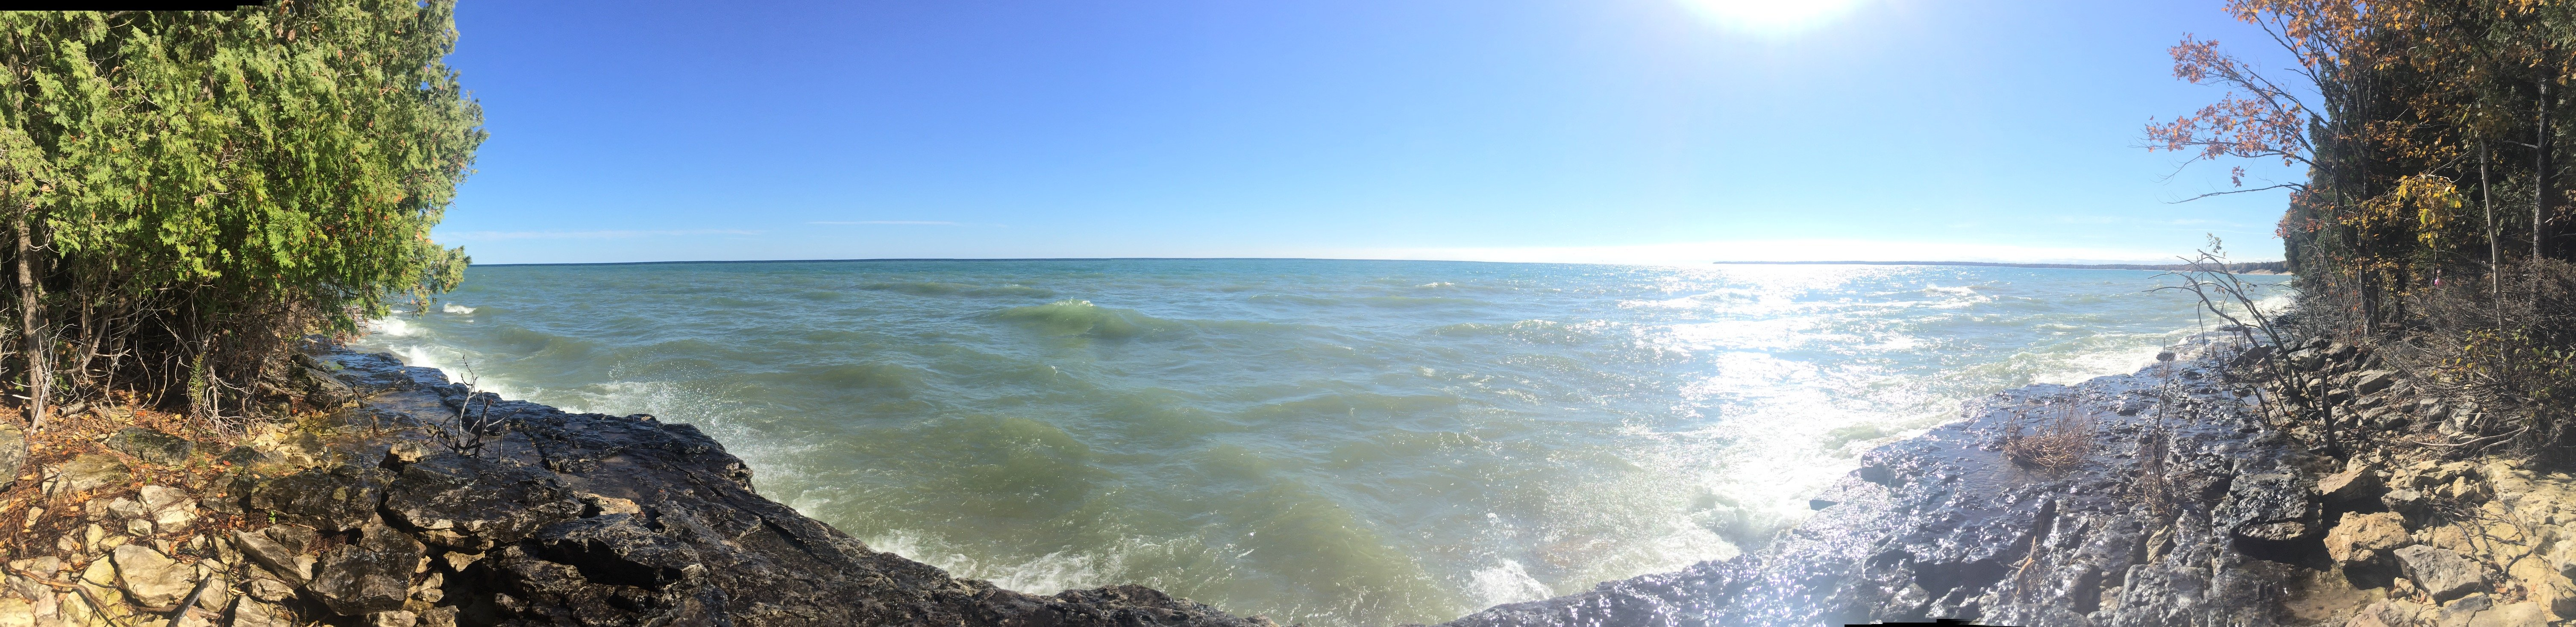 Water splashing on the Bay of Green Bay